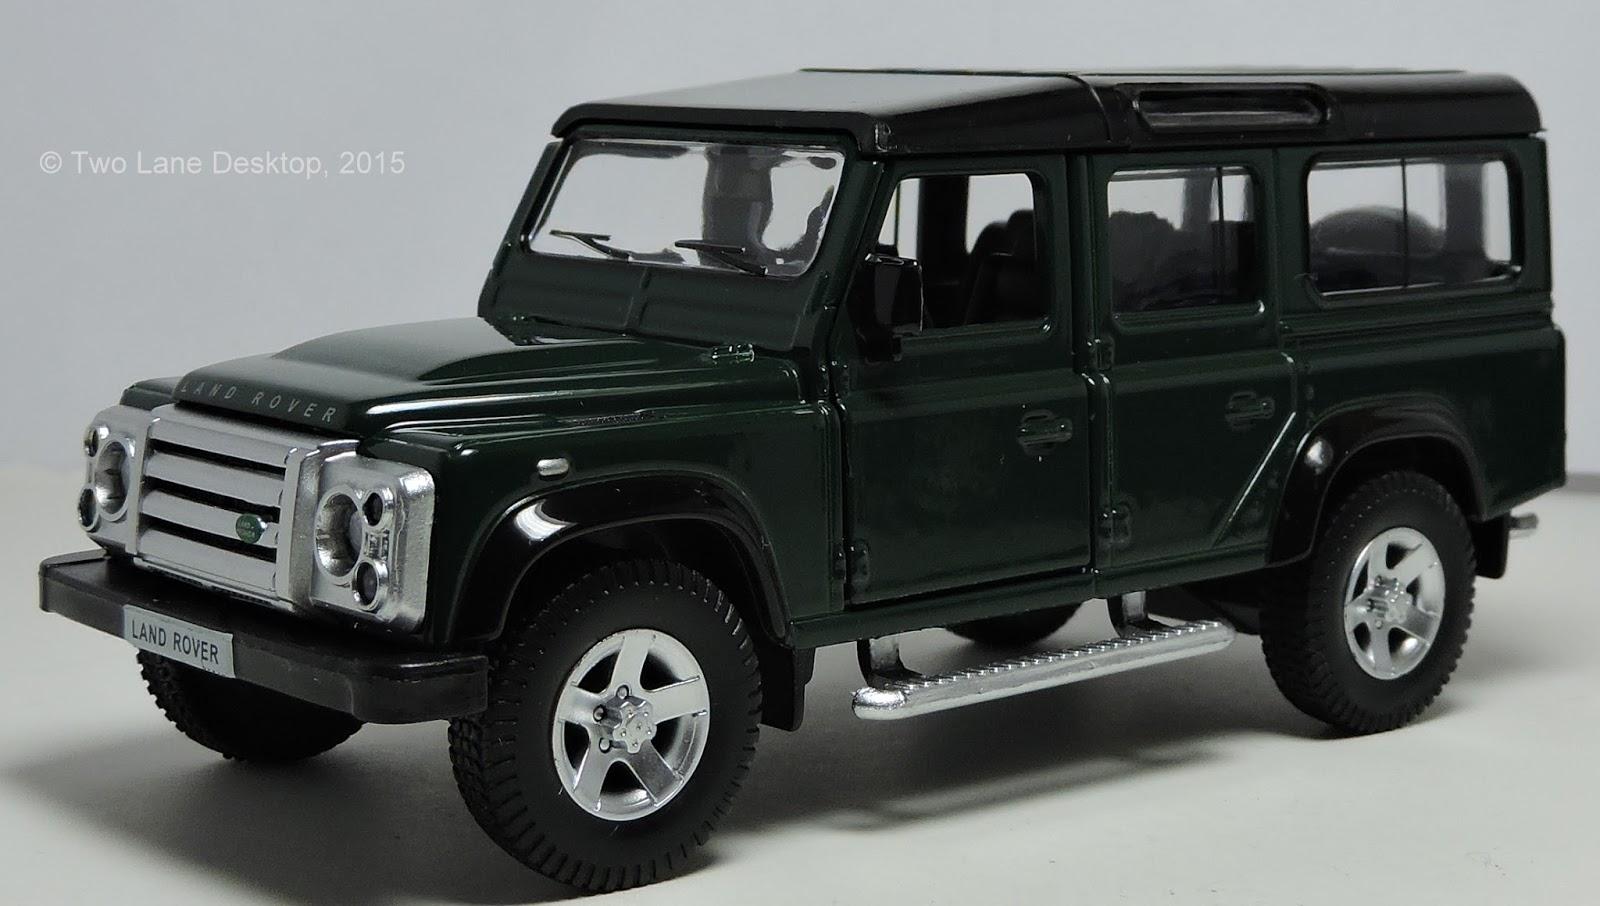 Car Toys Federal Way: Two Lane Desktop: RMZ City 1:40 And Matchbox 1:64 Land